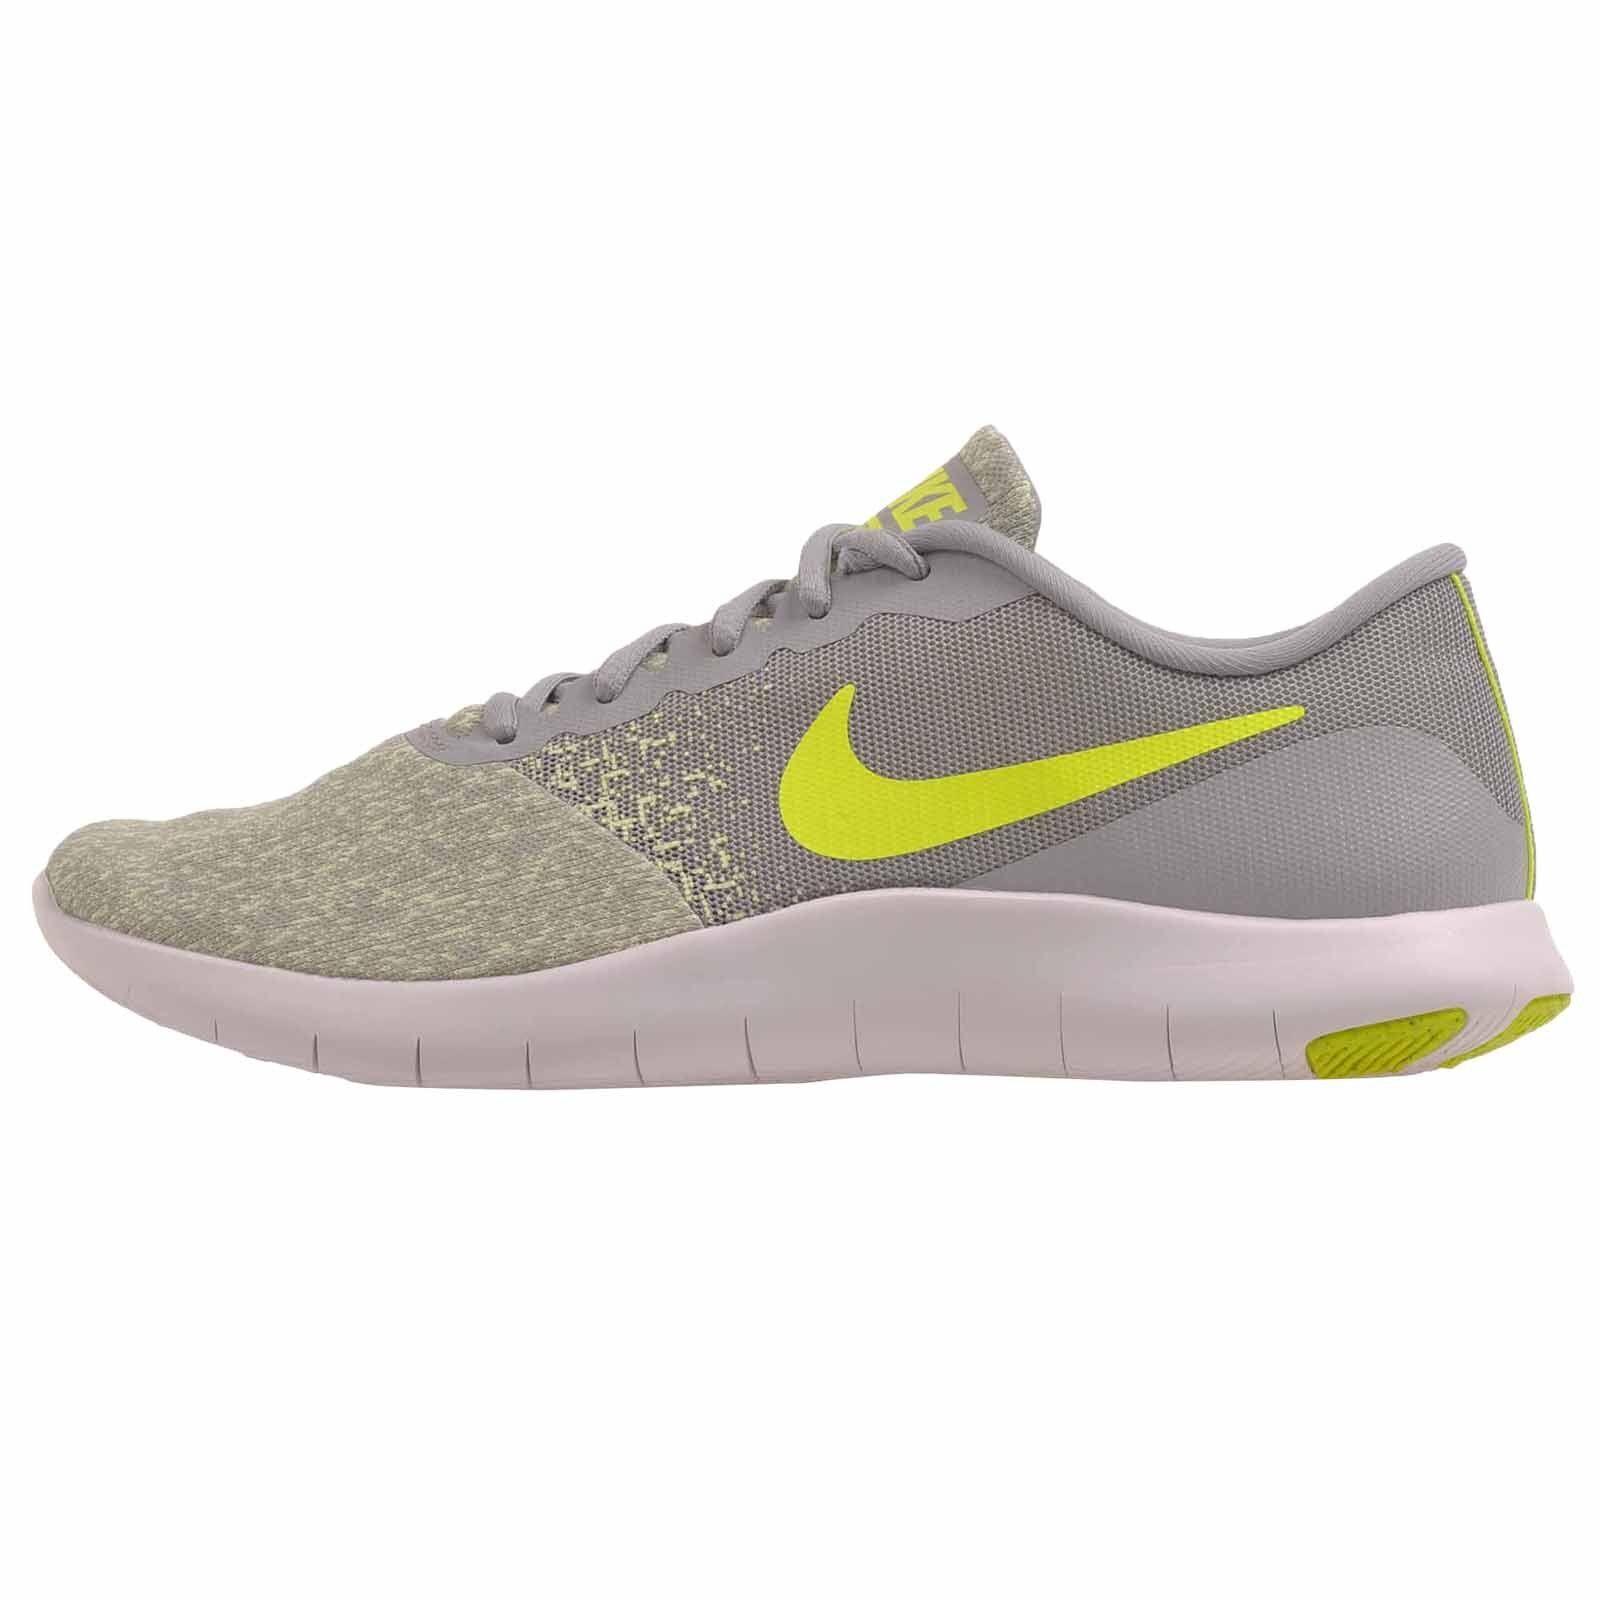 Nike Nike Nike frauen flex an laufschuh wolf grau / volt kaum volt 7 b (m) 52f75f